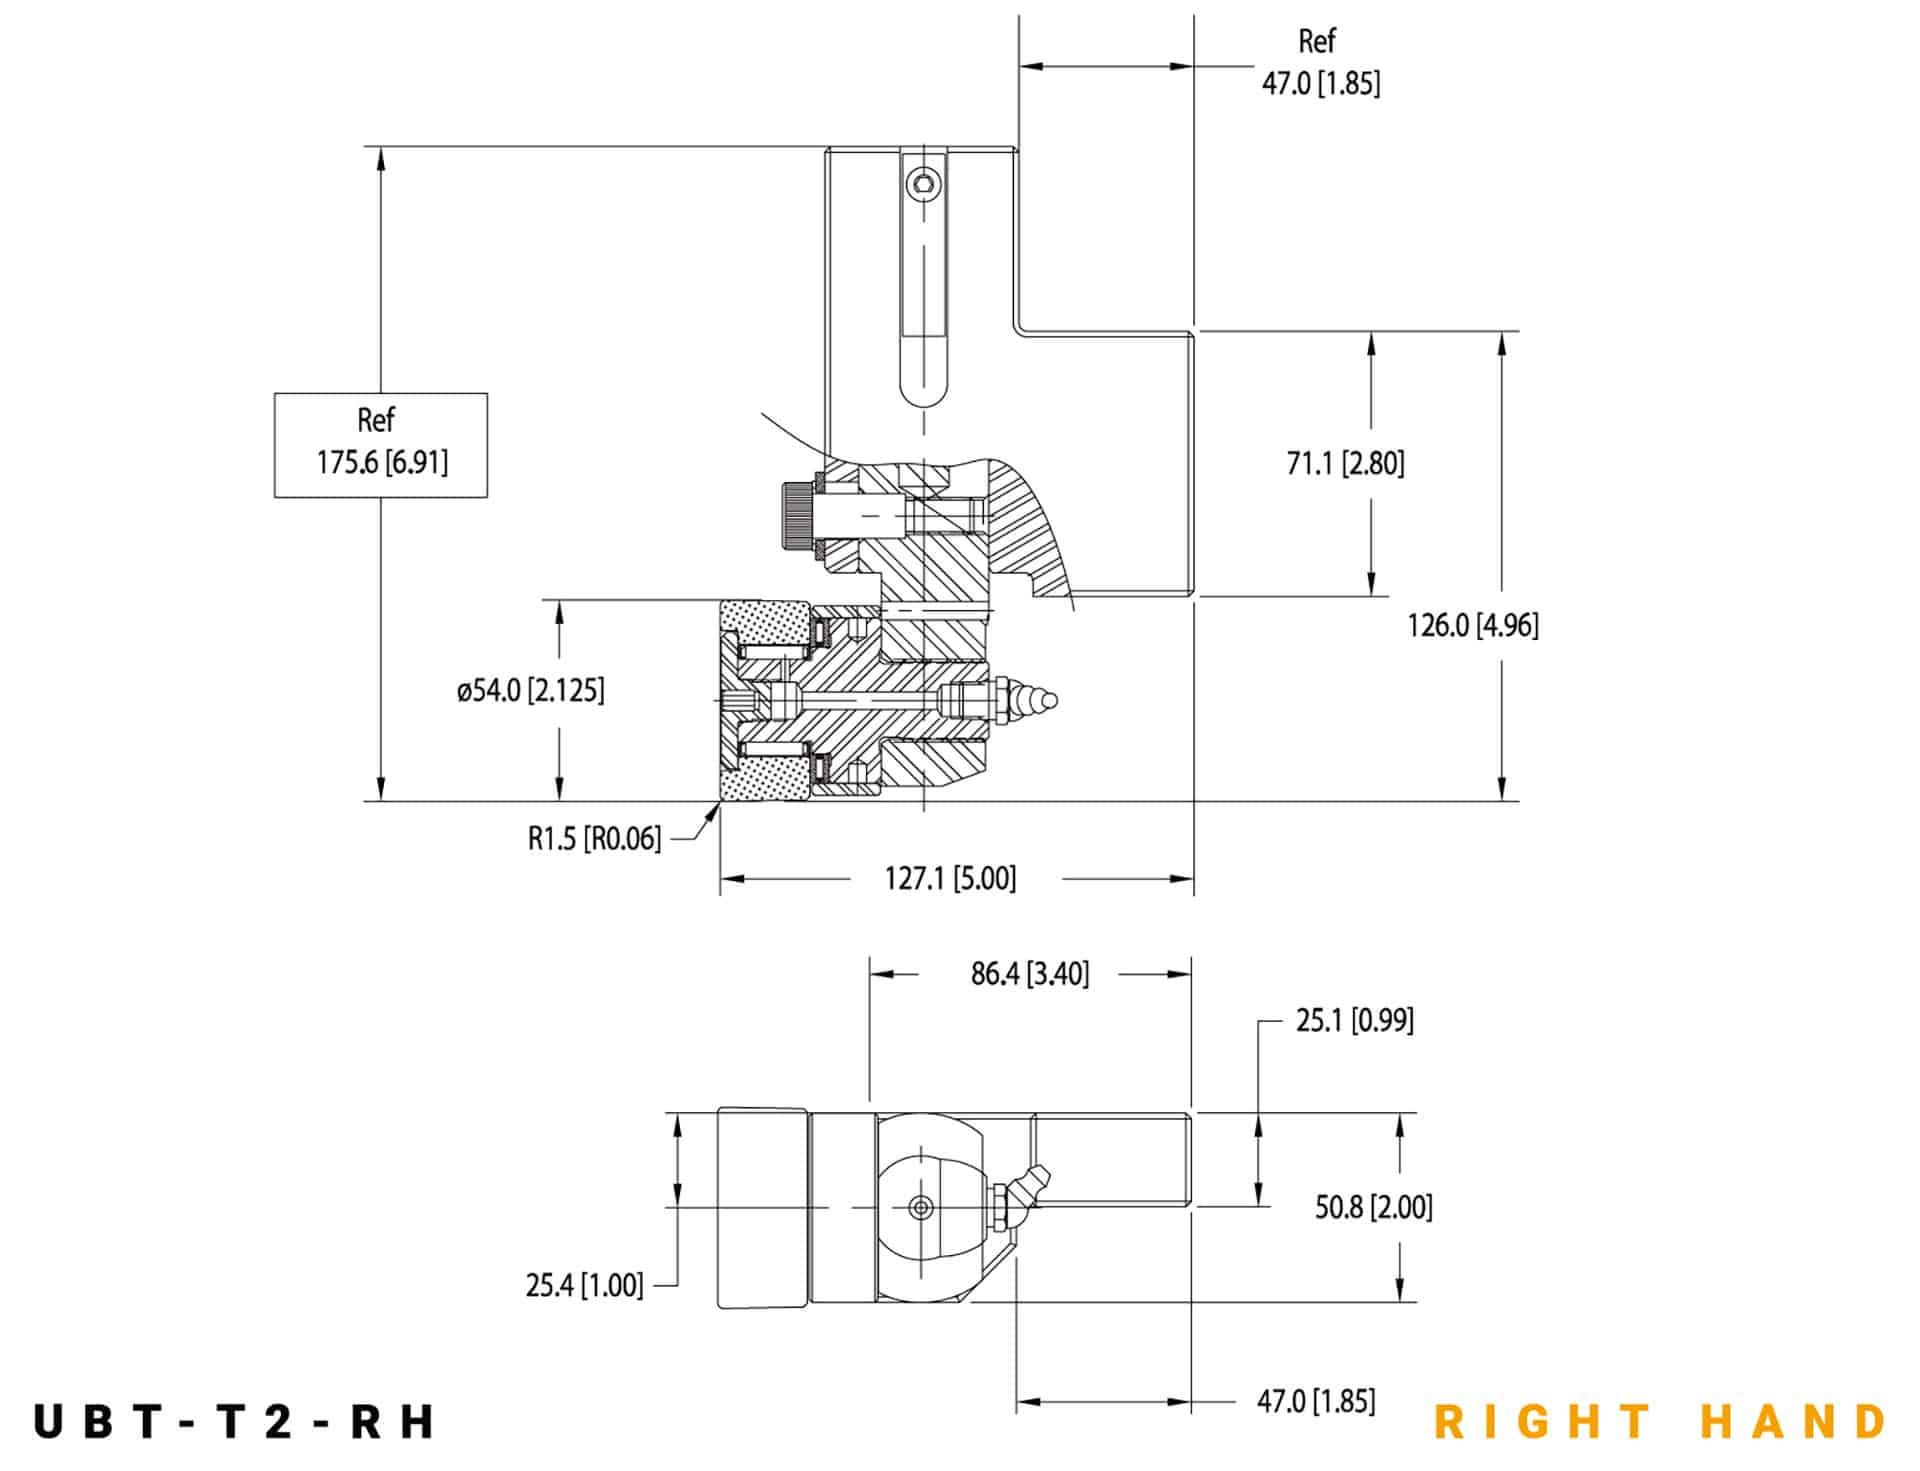 UBT-T2 RH specifications